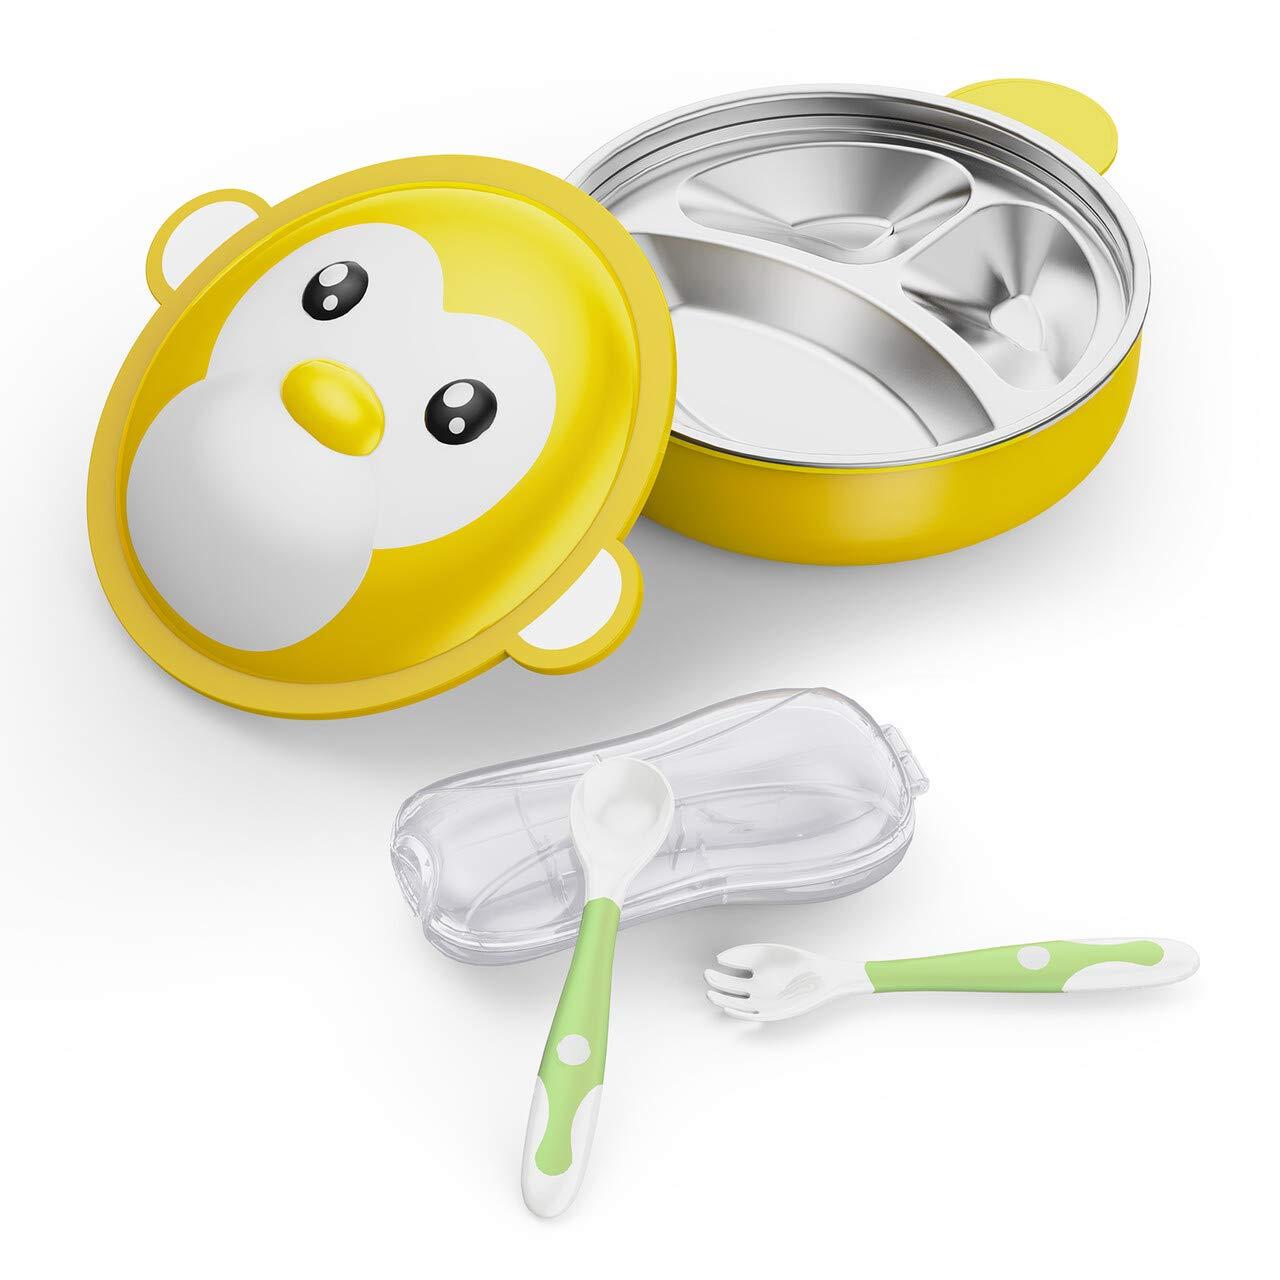 BabyKing Cartoon Monkey Baby Feeding Set, Baby Warming Bowl & Bendable Spoons Forks, Healthy Children Tableware Set for Baby Preschoolers & Little Pupils by BabyKing